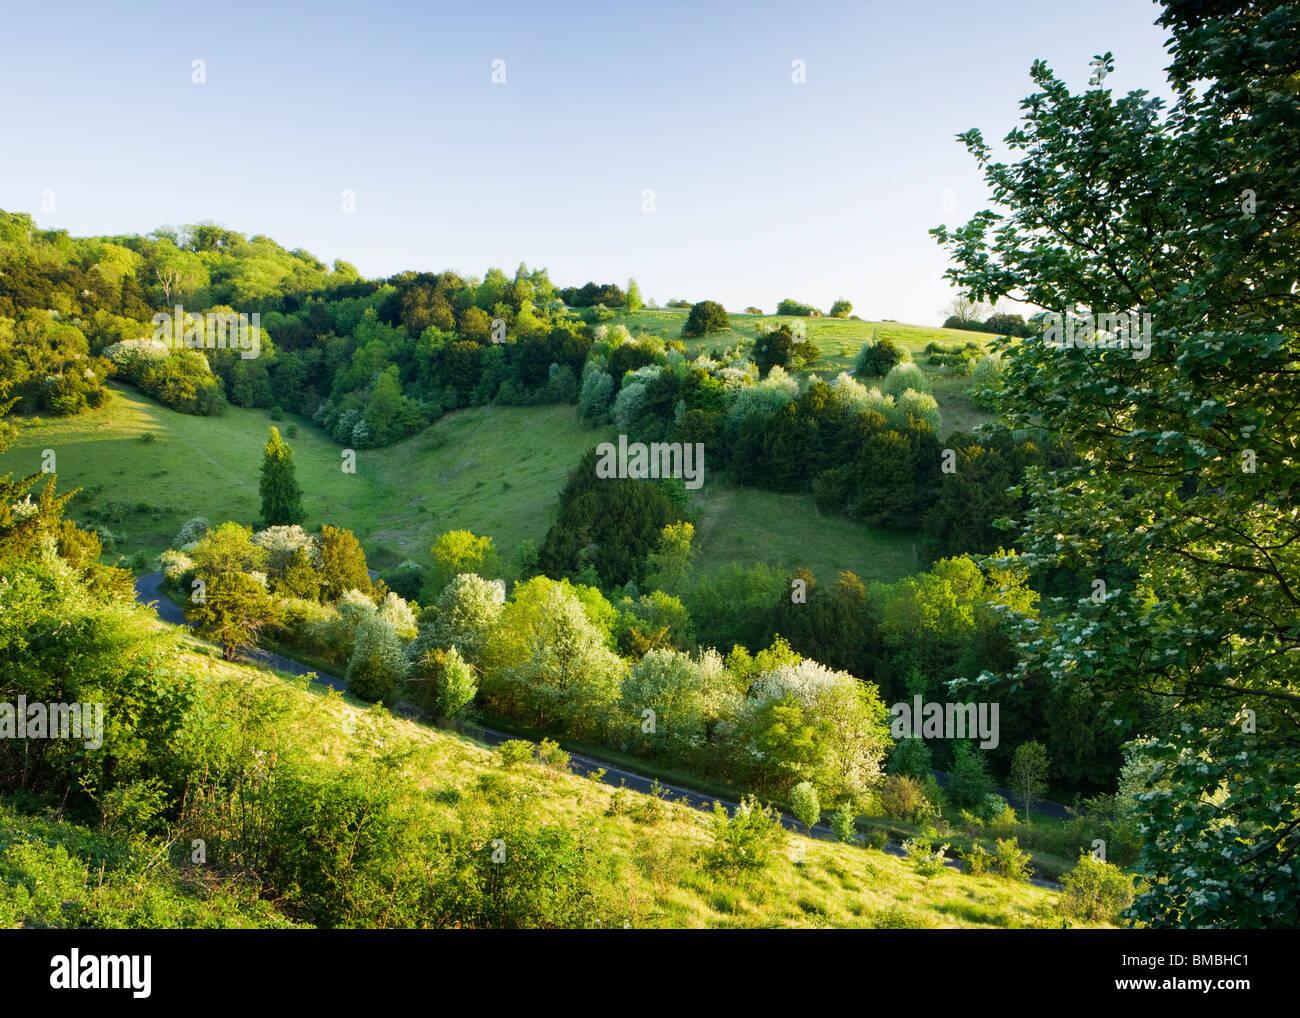 Fort Hill au zig-zag, Surrey, UK. Printemps Photo Stock